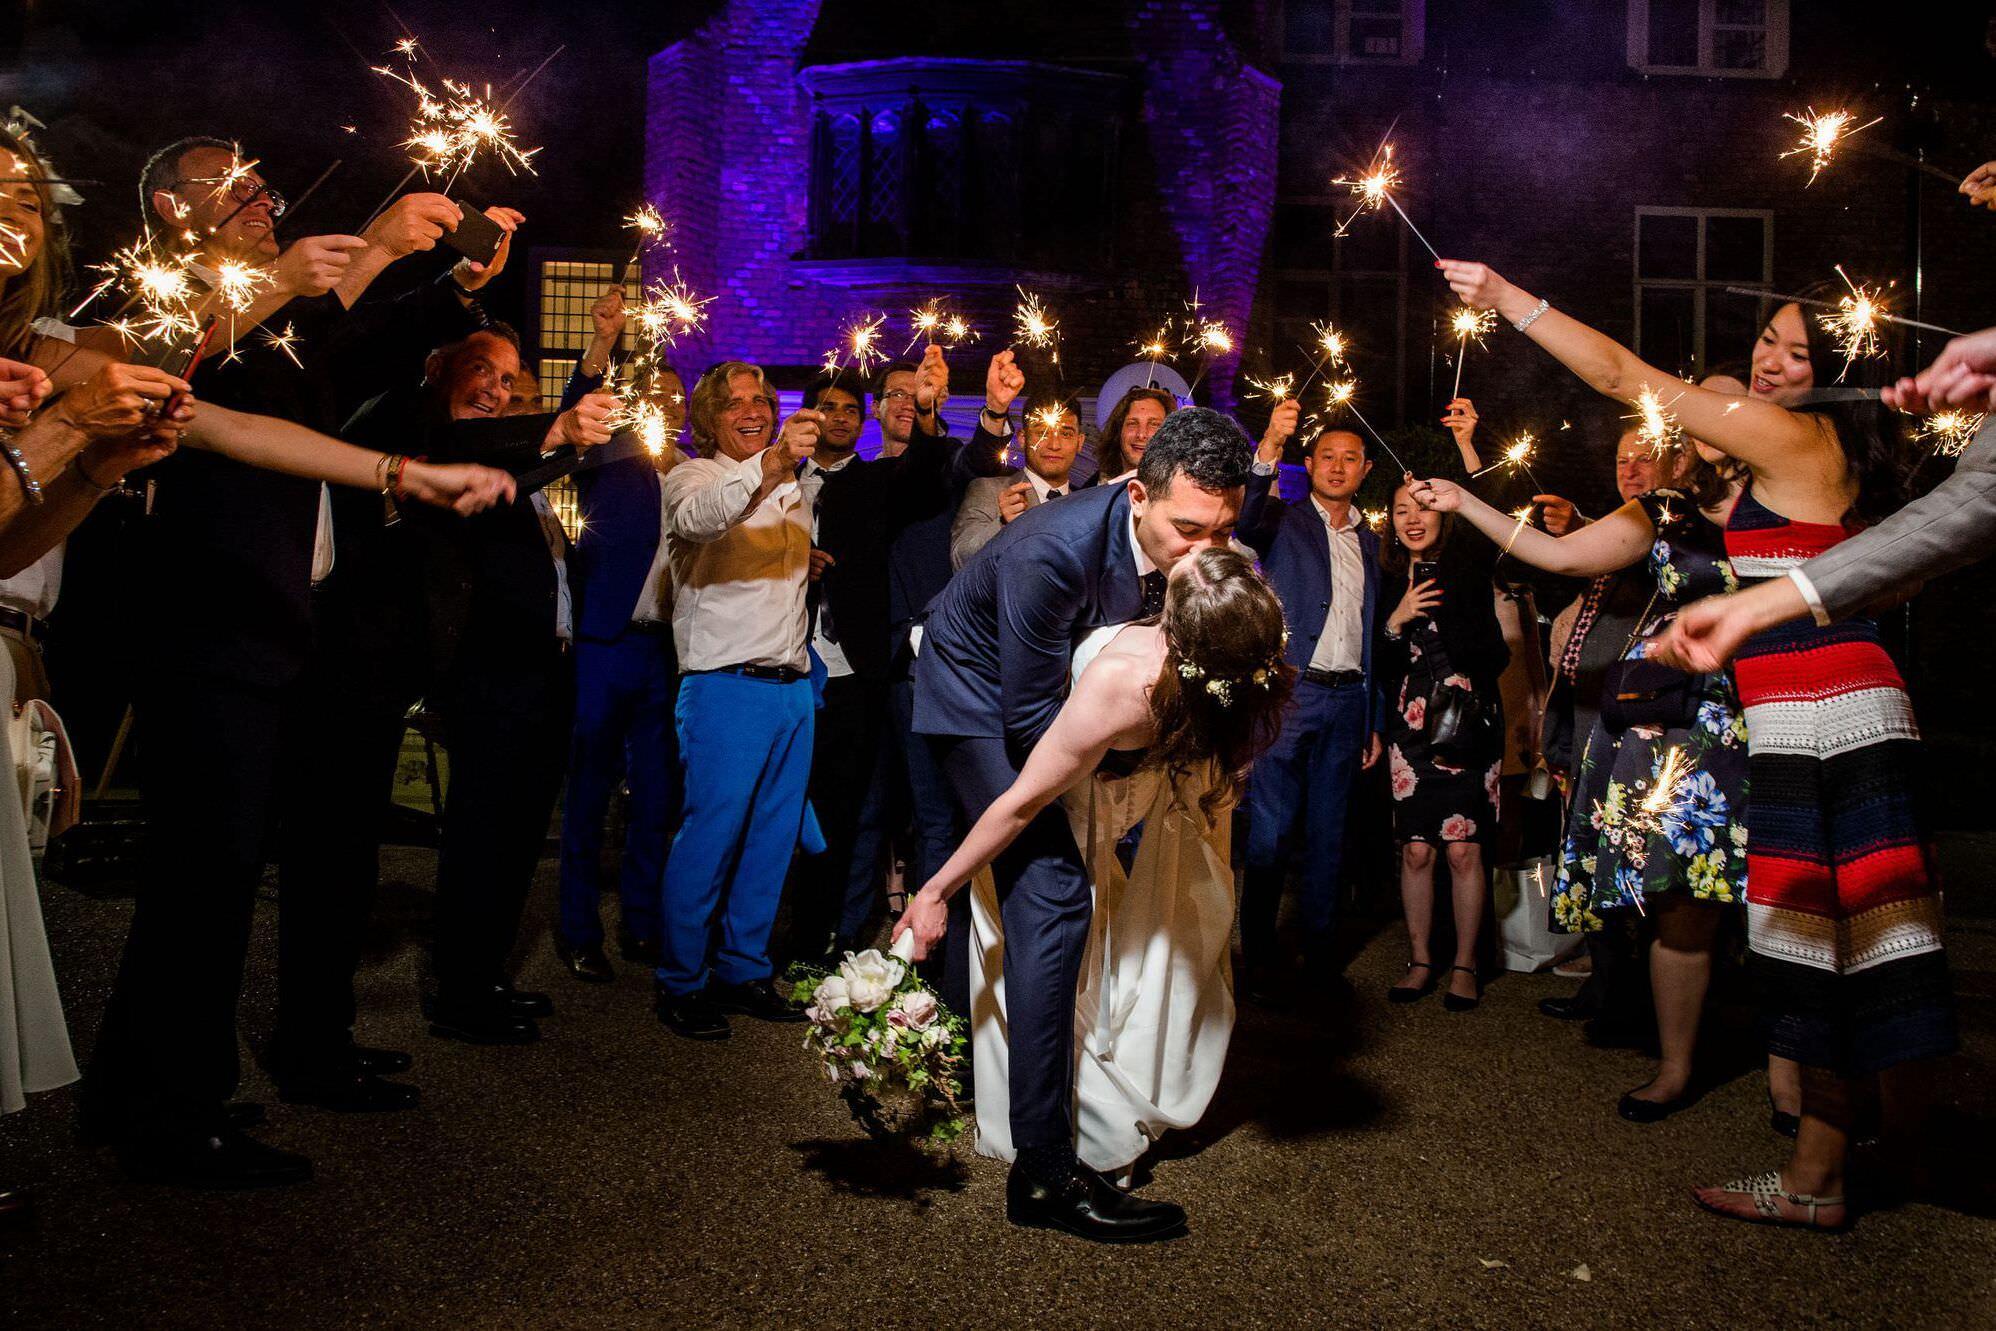 Mark-Seymour-Wedding-Photographer-UK-21 10